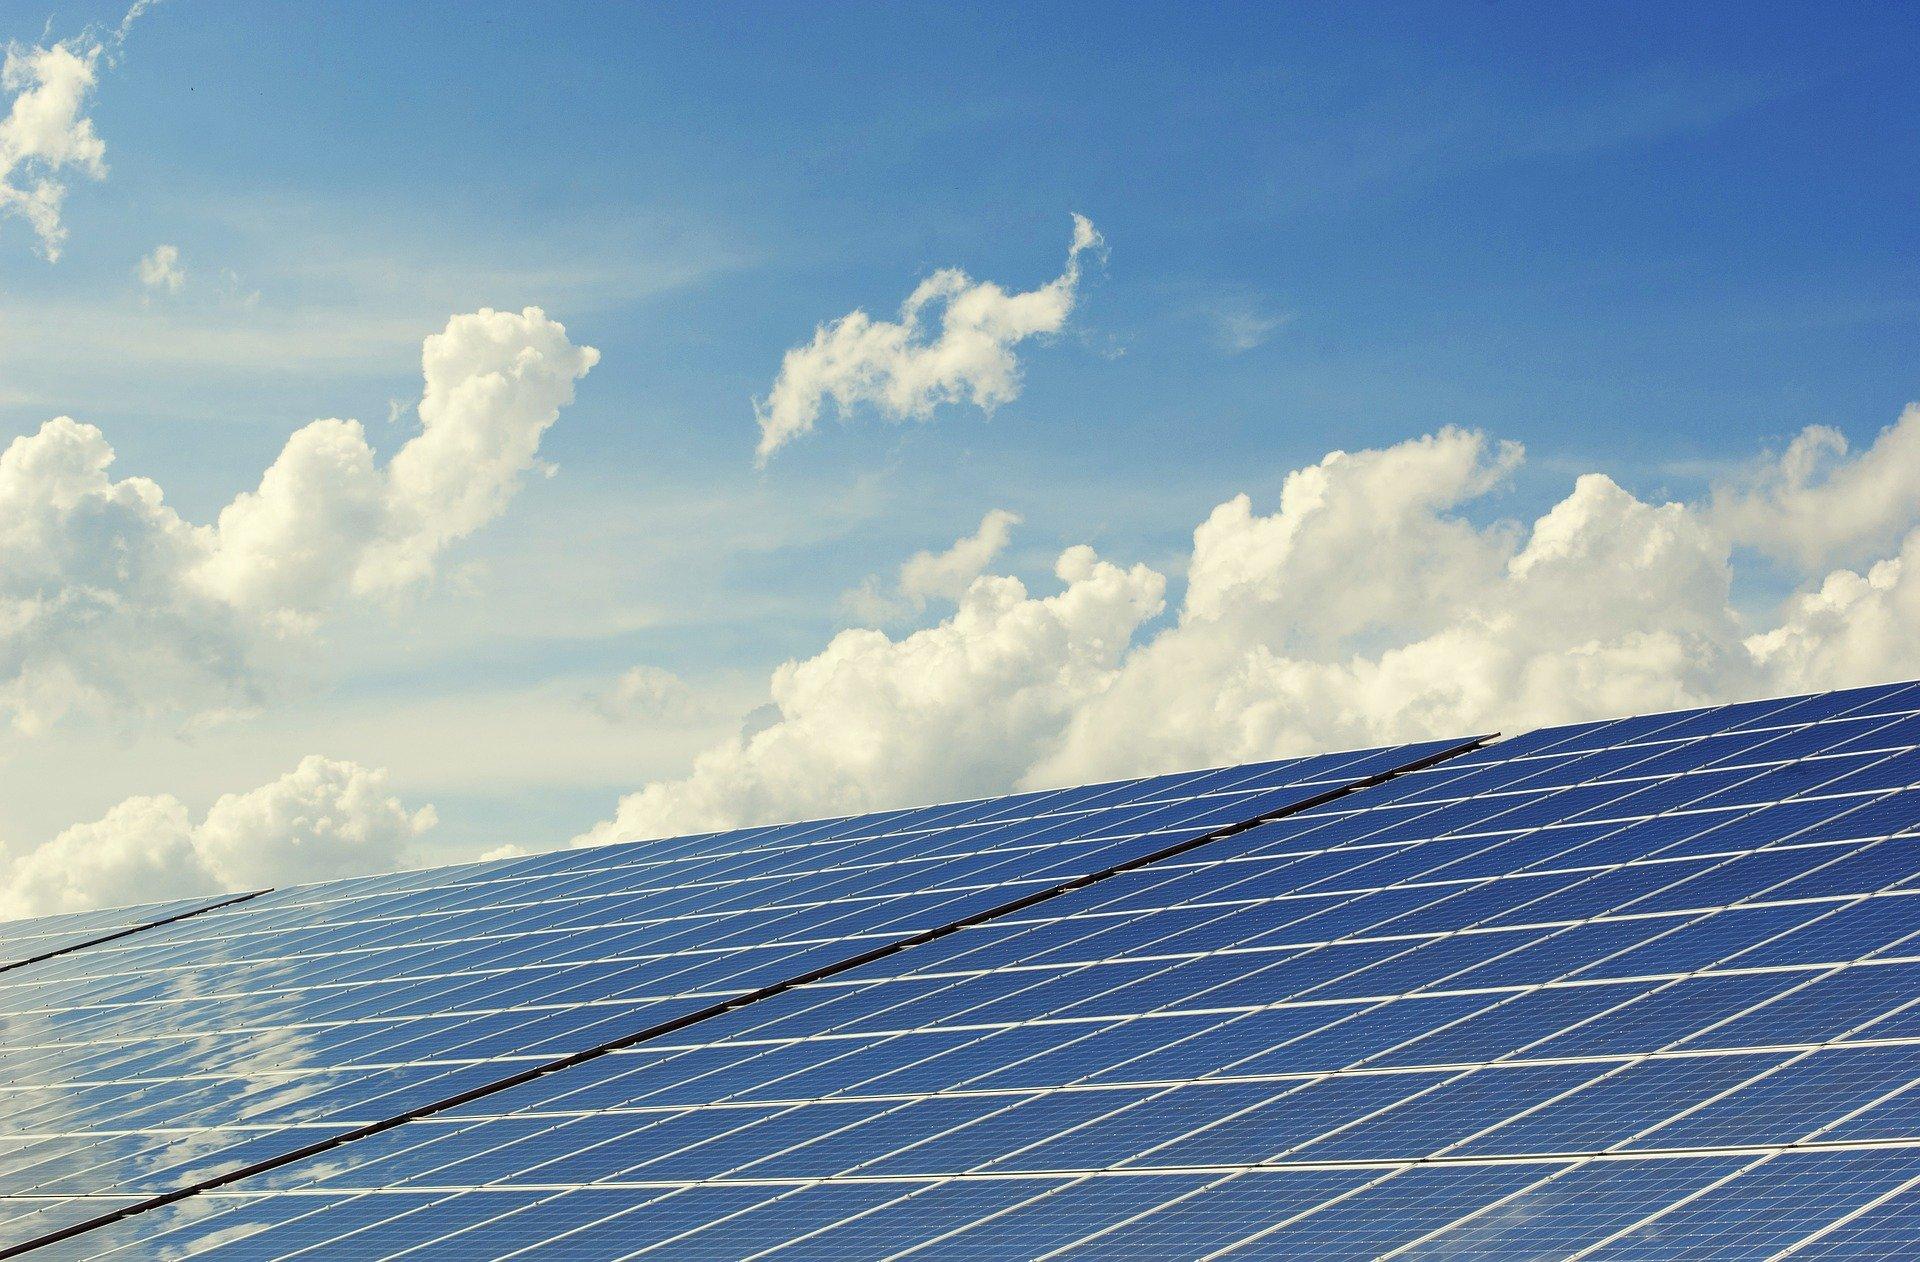 Online-Vortrag zum Thema Solarstrom